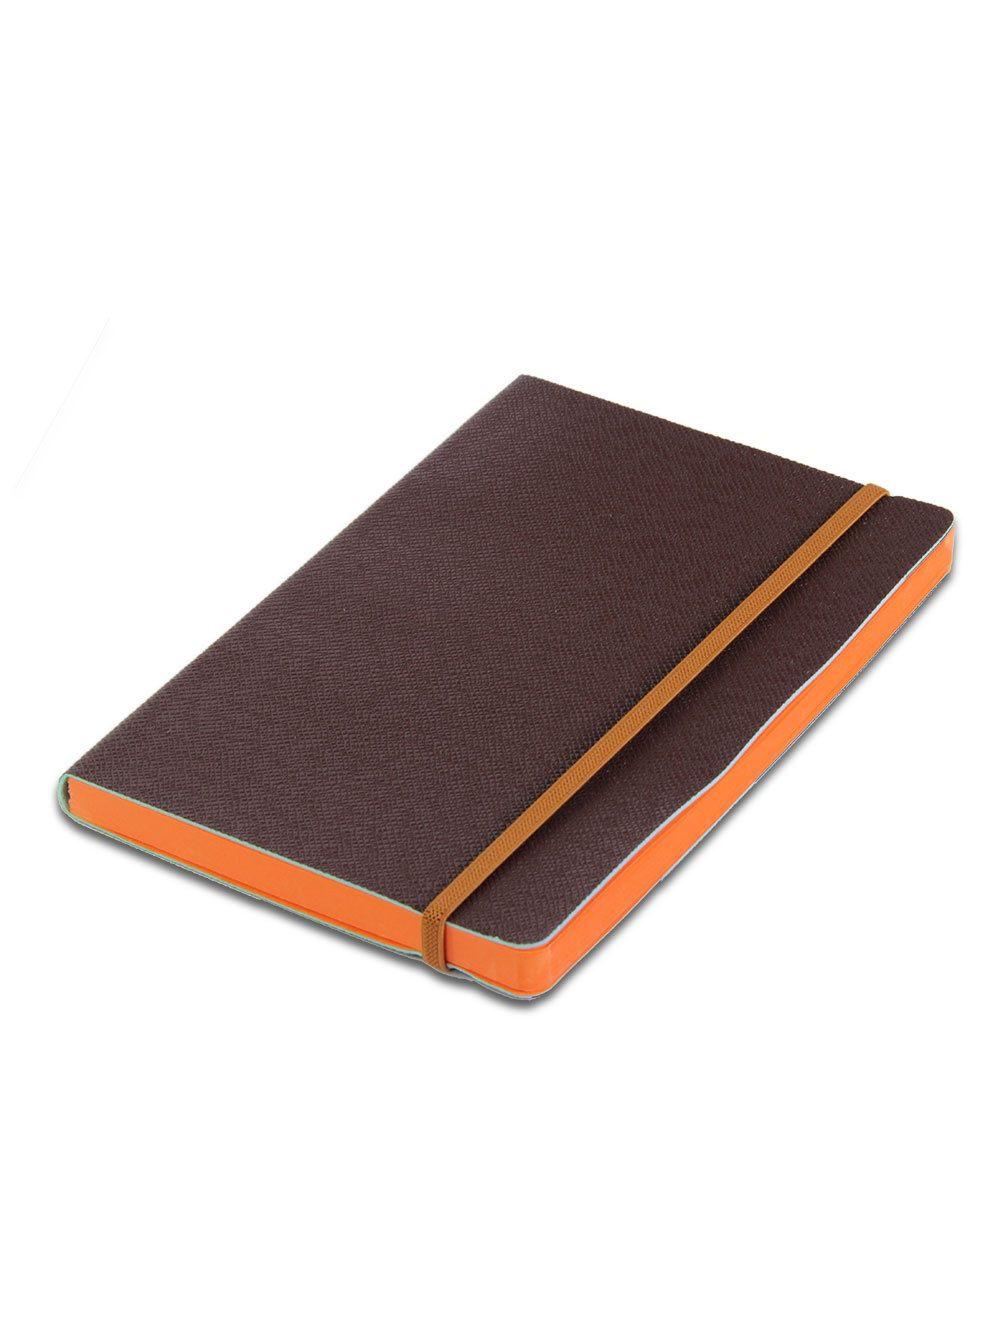 Journal Con Elastico 14,5 X 21 Cm - Coloured Internal Paper  - Brown